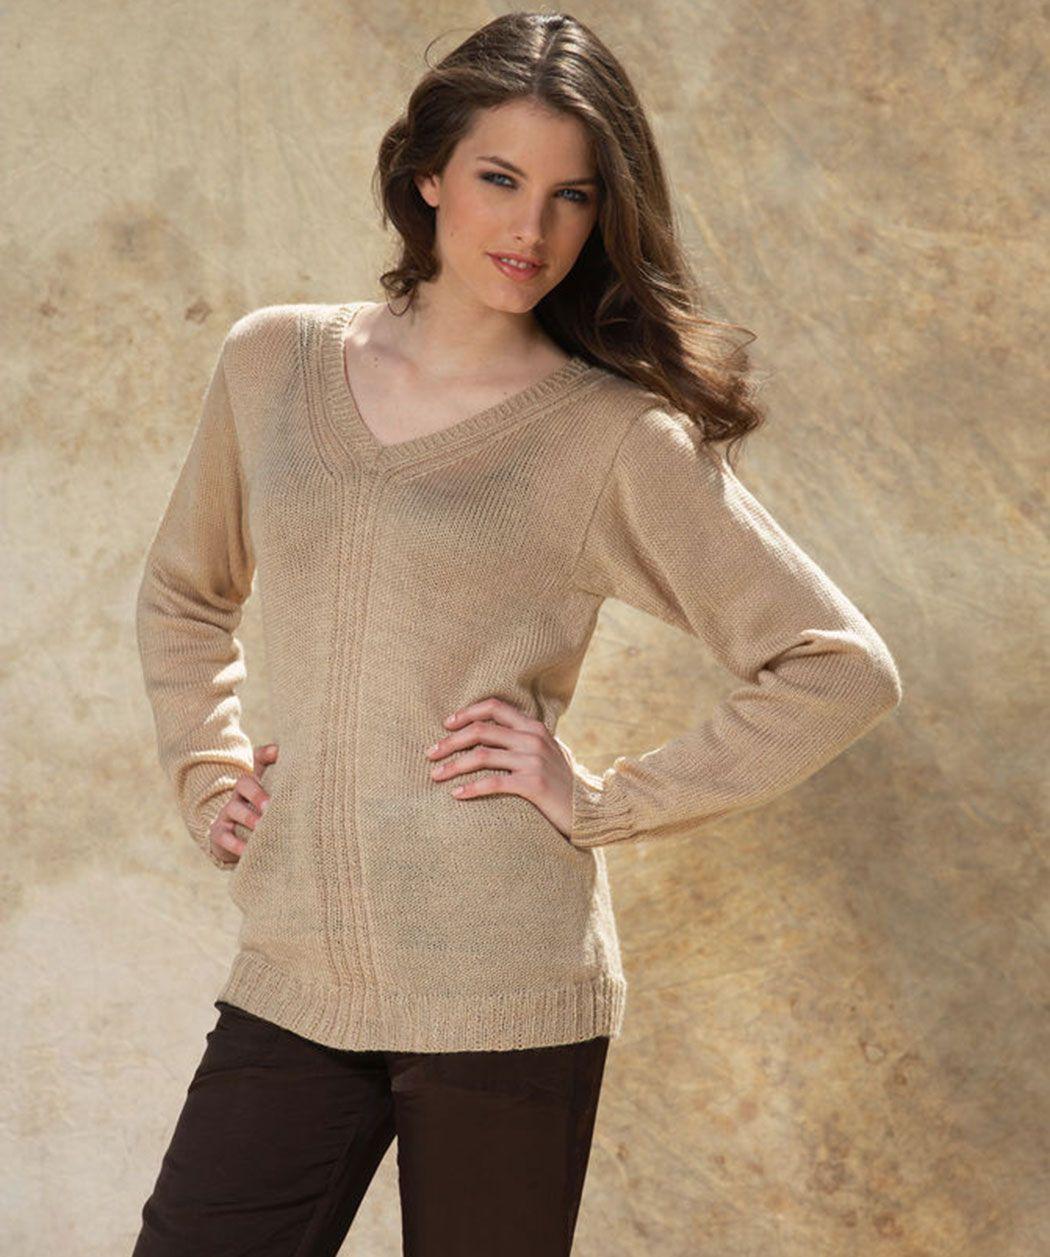 Helen Jumper Free Knitting Pattern #RedHeart #Margareta | Knitting ...